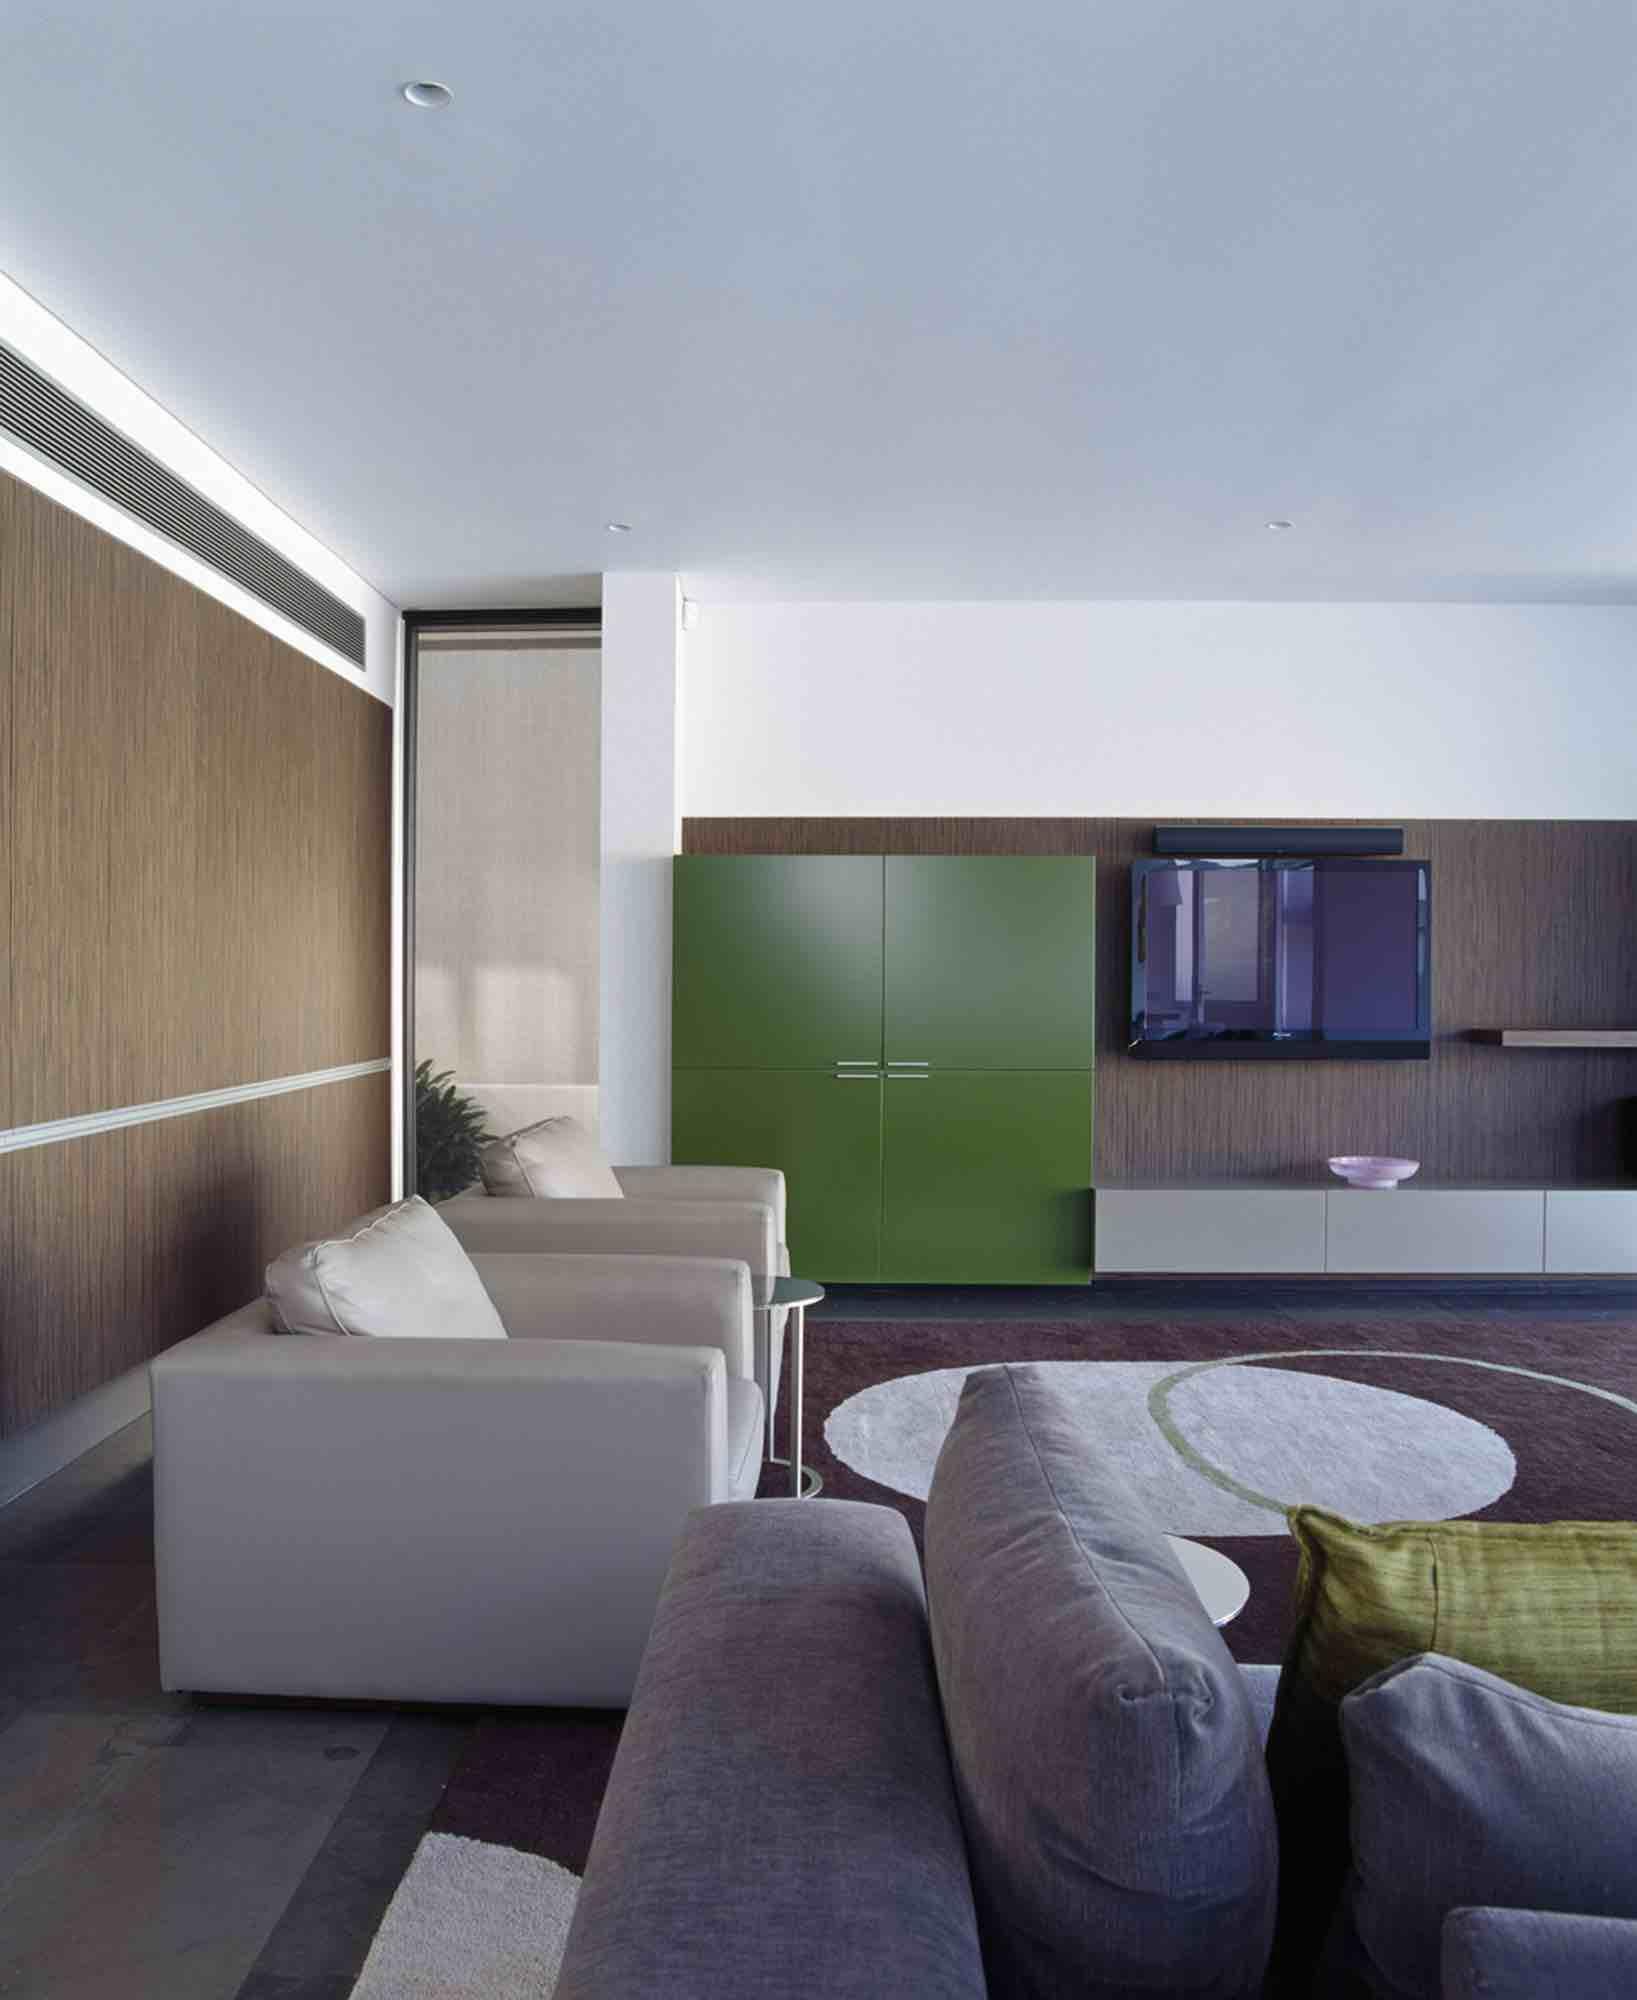 minosa-design-high-voids-sitting-room-modern-custom-joinery-gas-fireplace-limestone-floor-05